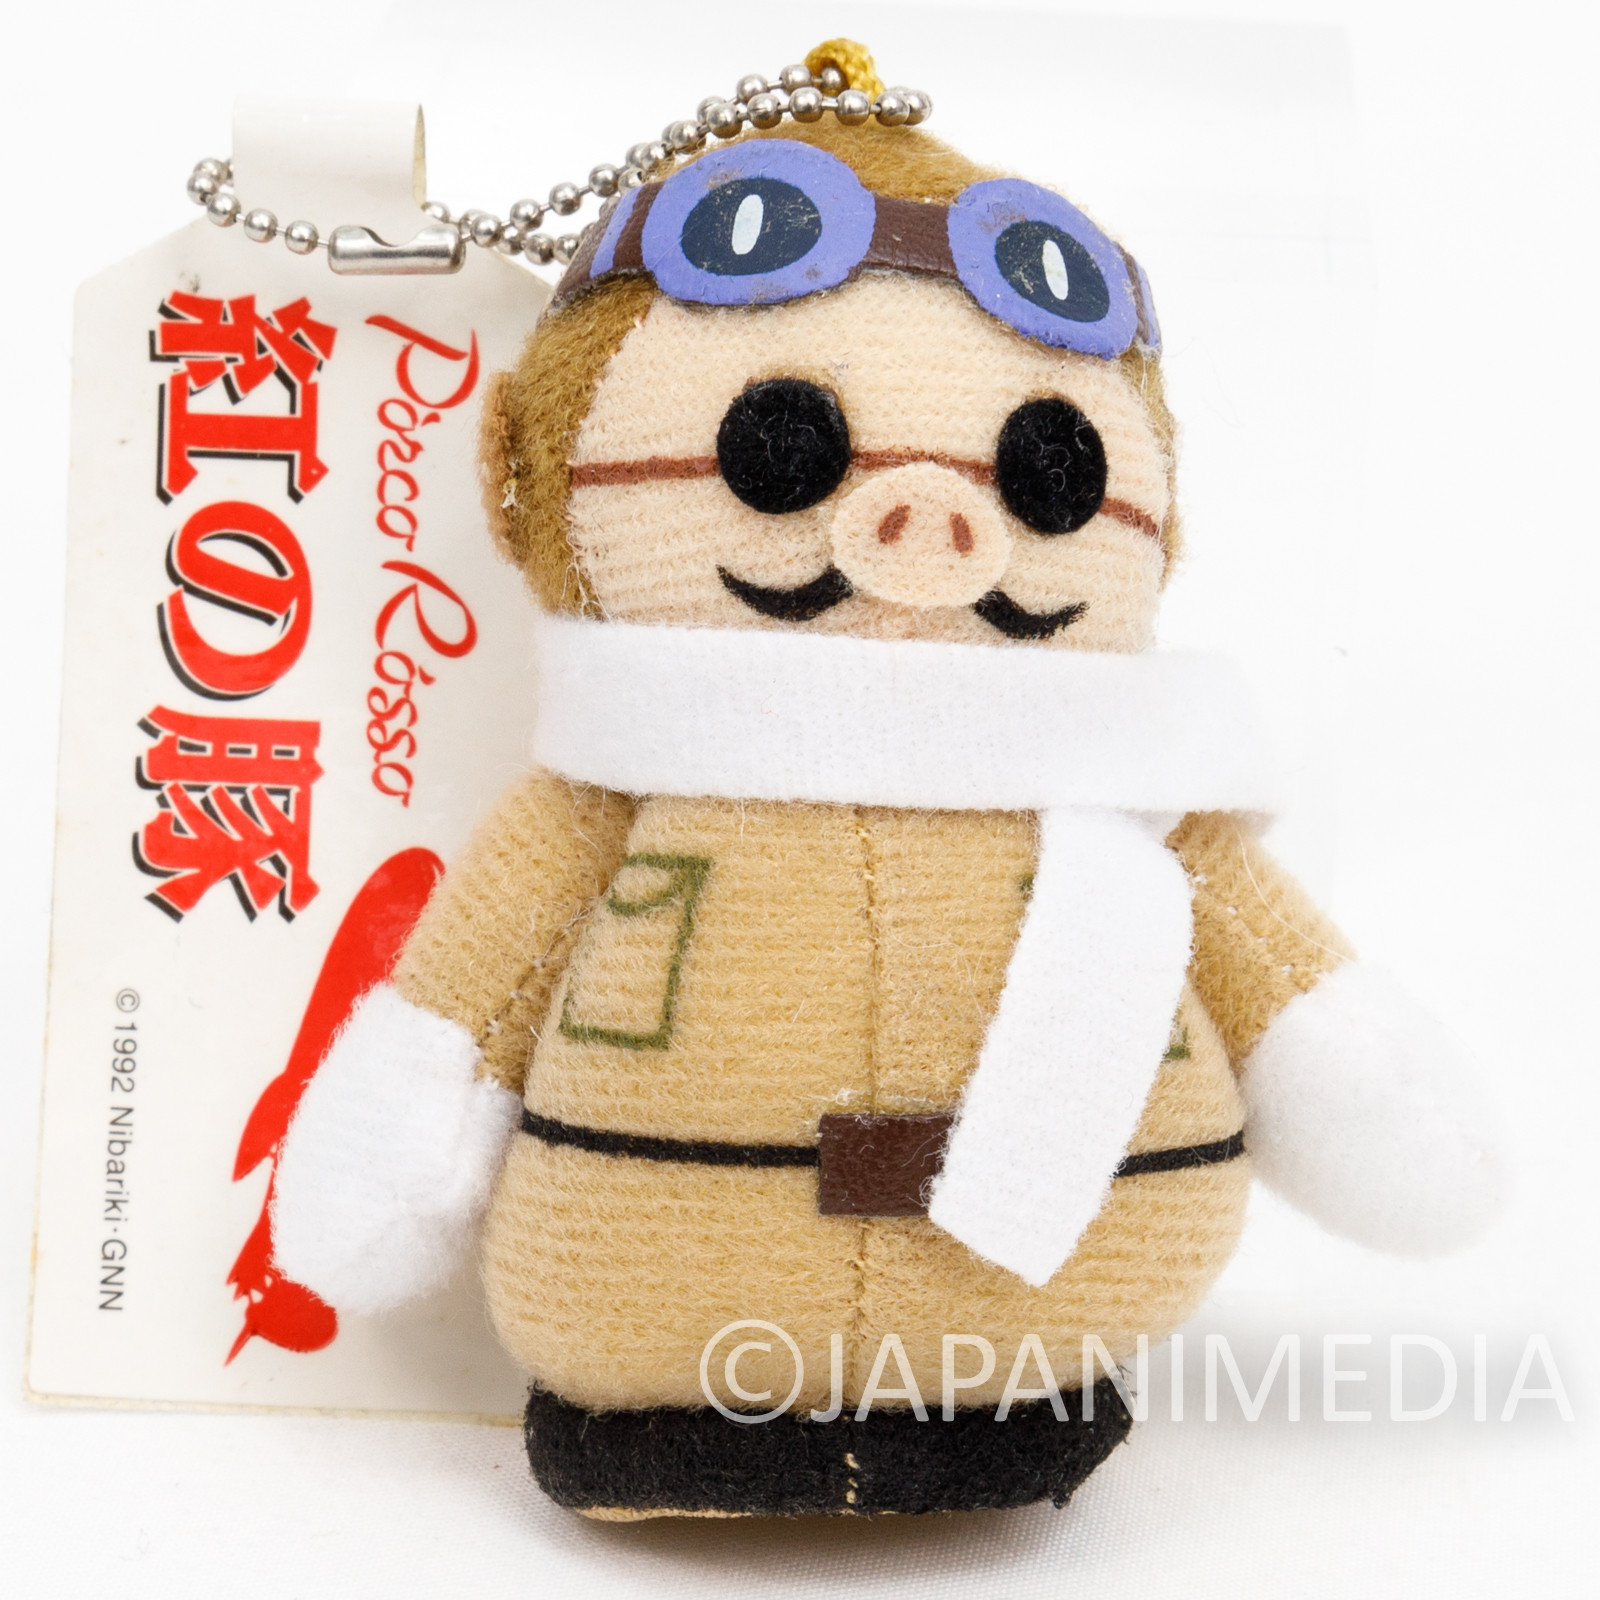 RARE! Porco Rosso Marco Pagot Finger Puppet Plush Doll Ballchain Ghibli